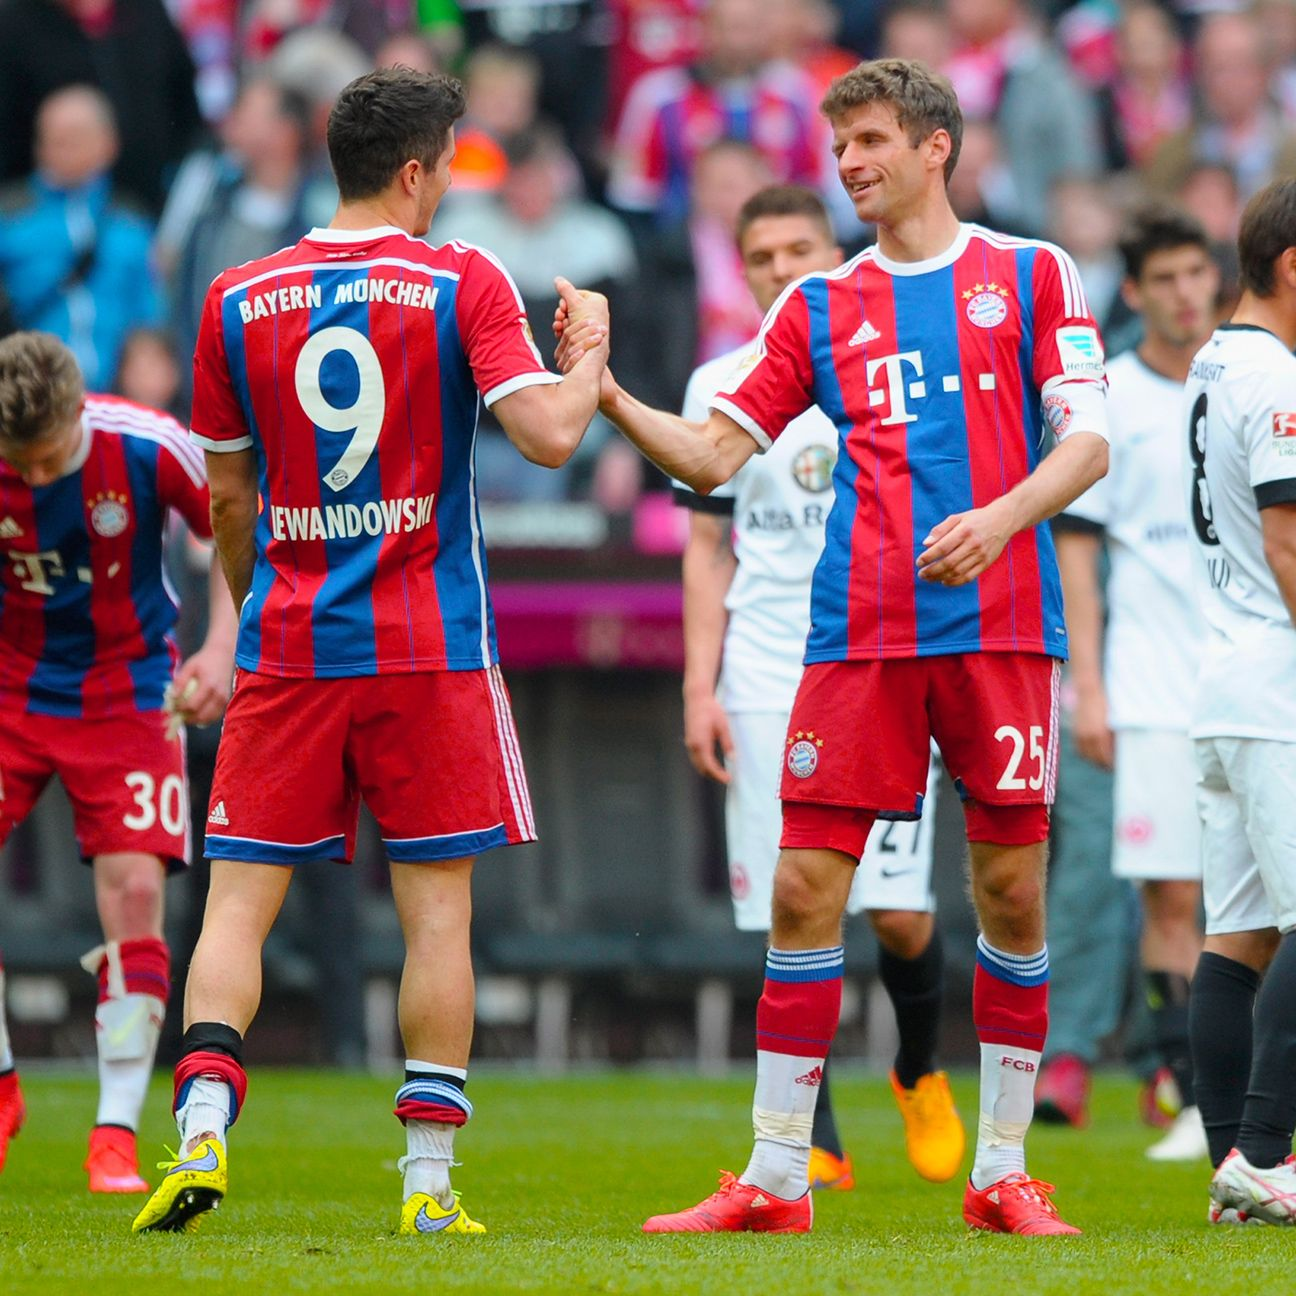 Robert Lewandowski and Thomas Muller teamed up to put Bayern on the cusp of another Bundesliga title.